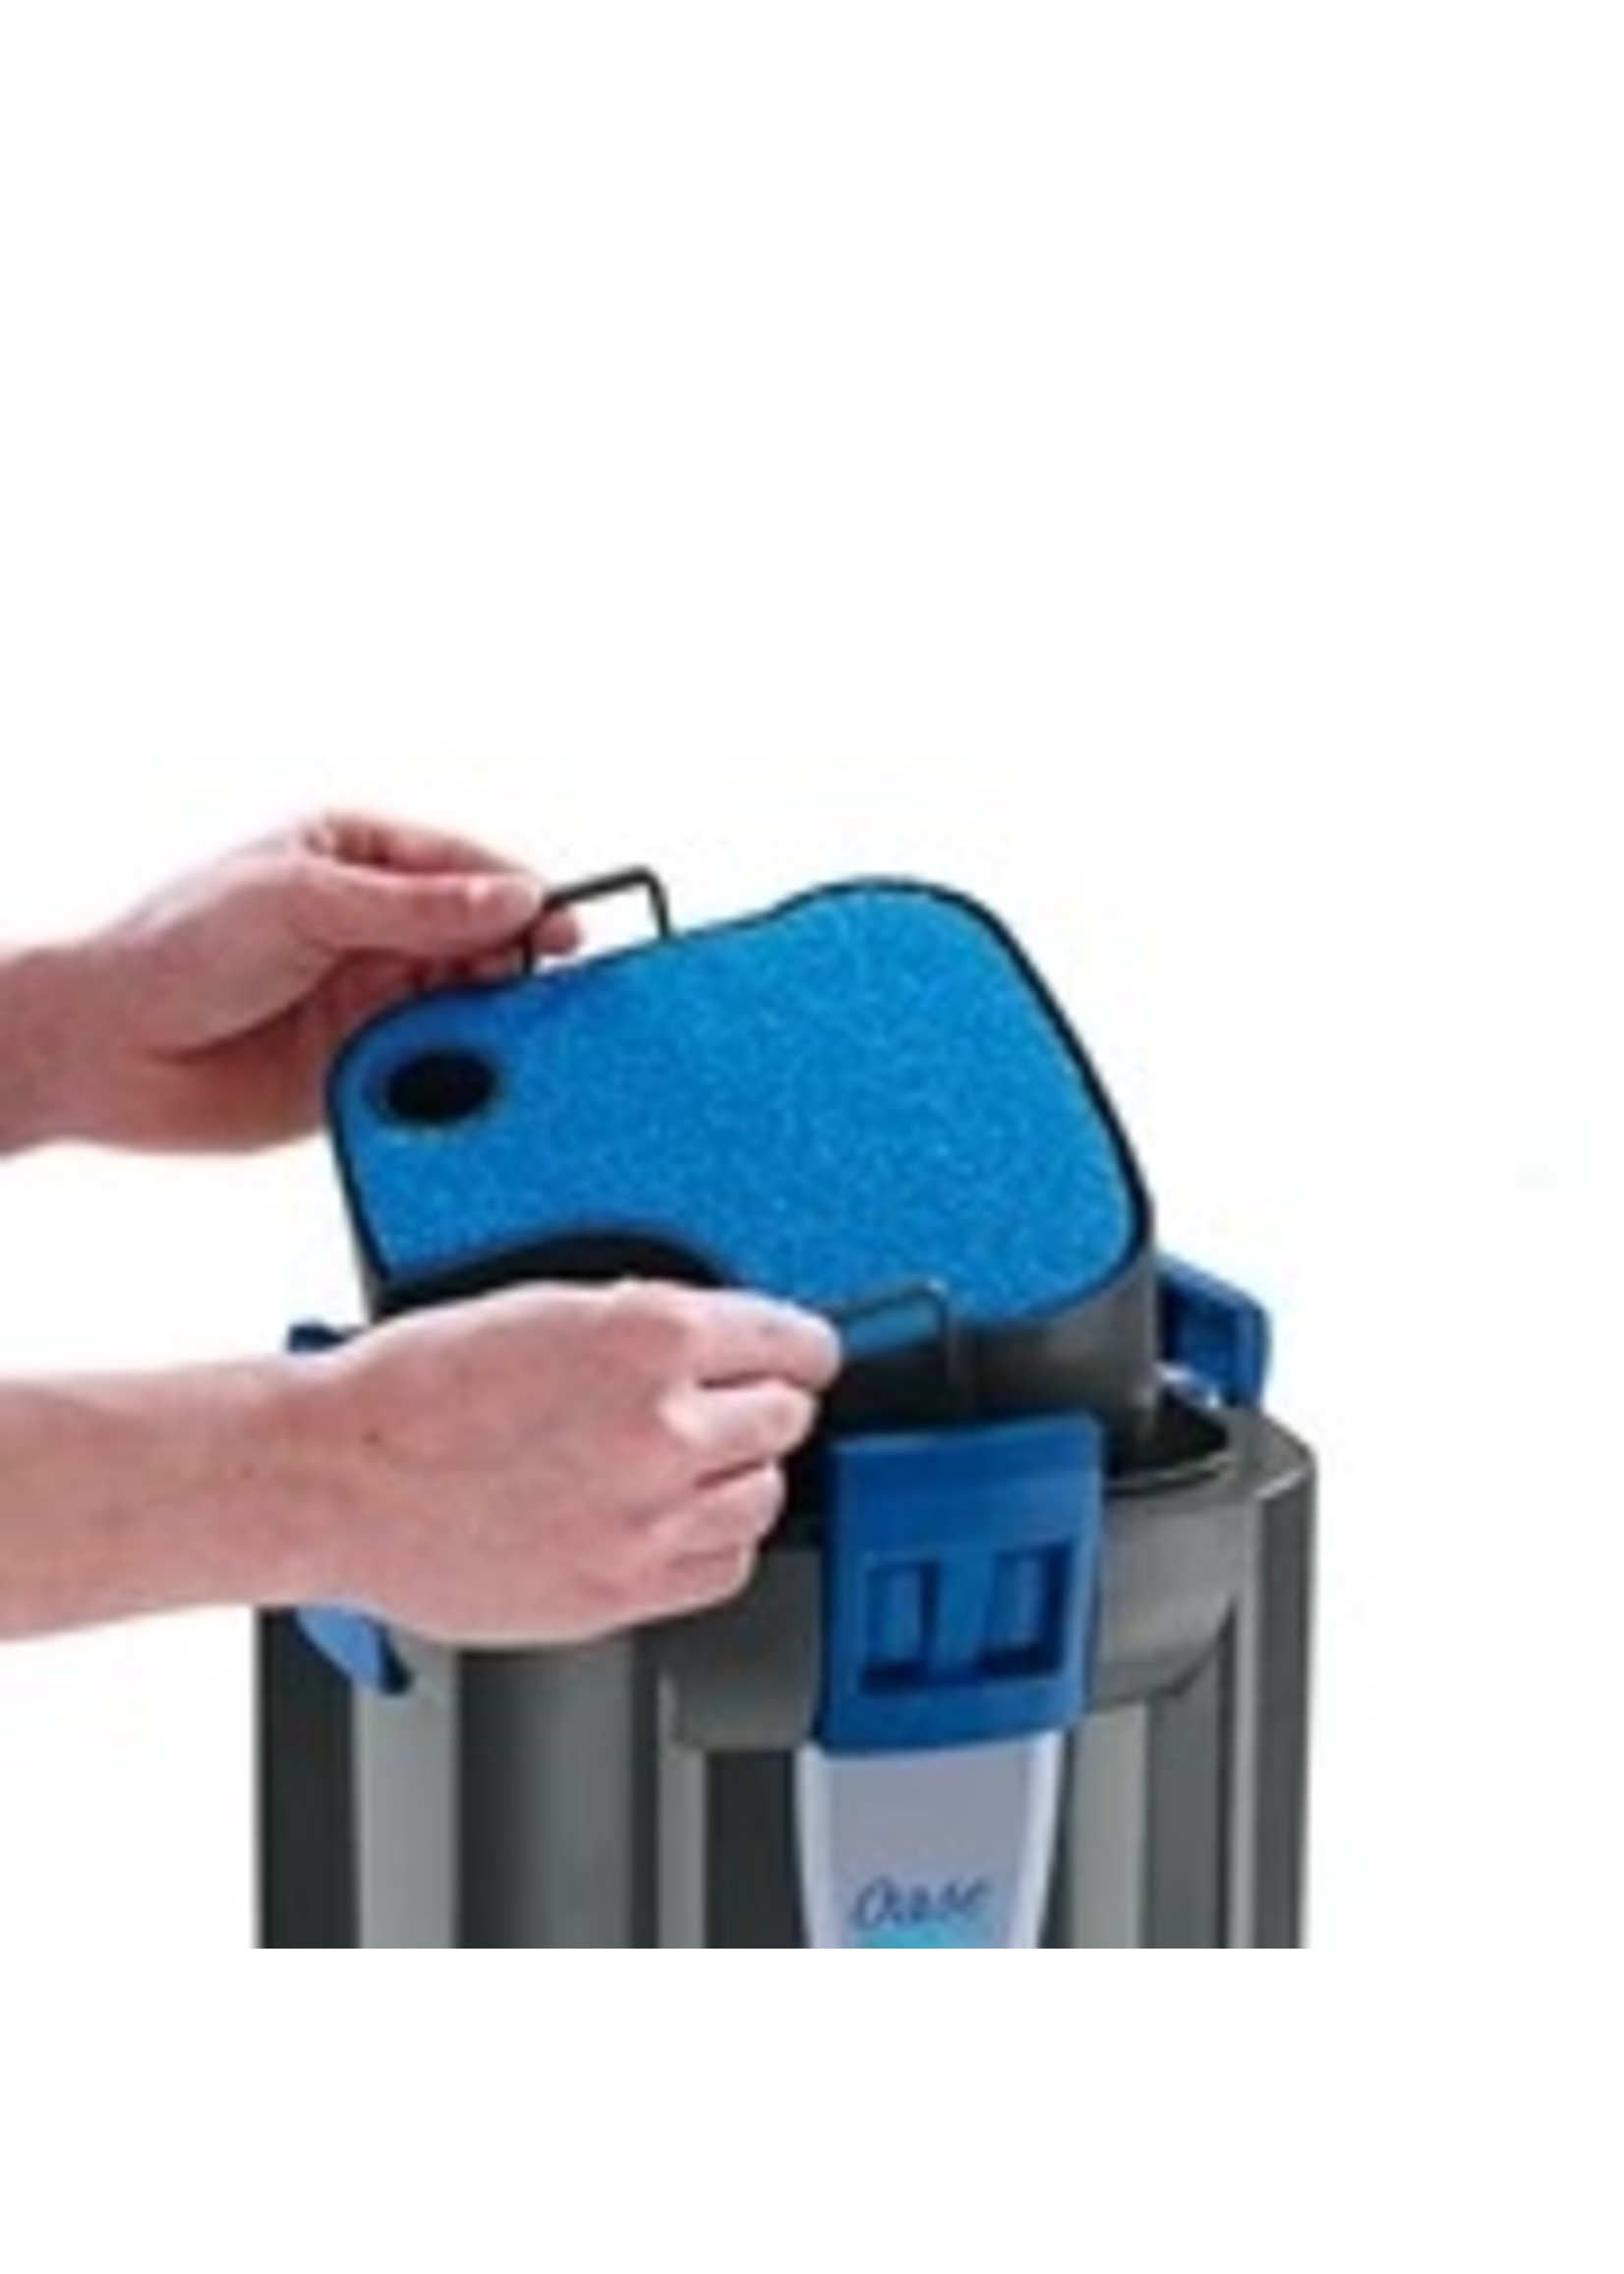 OASE OASE BioMaster 600 External Filter